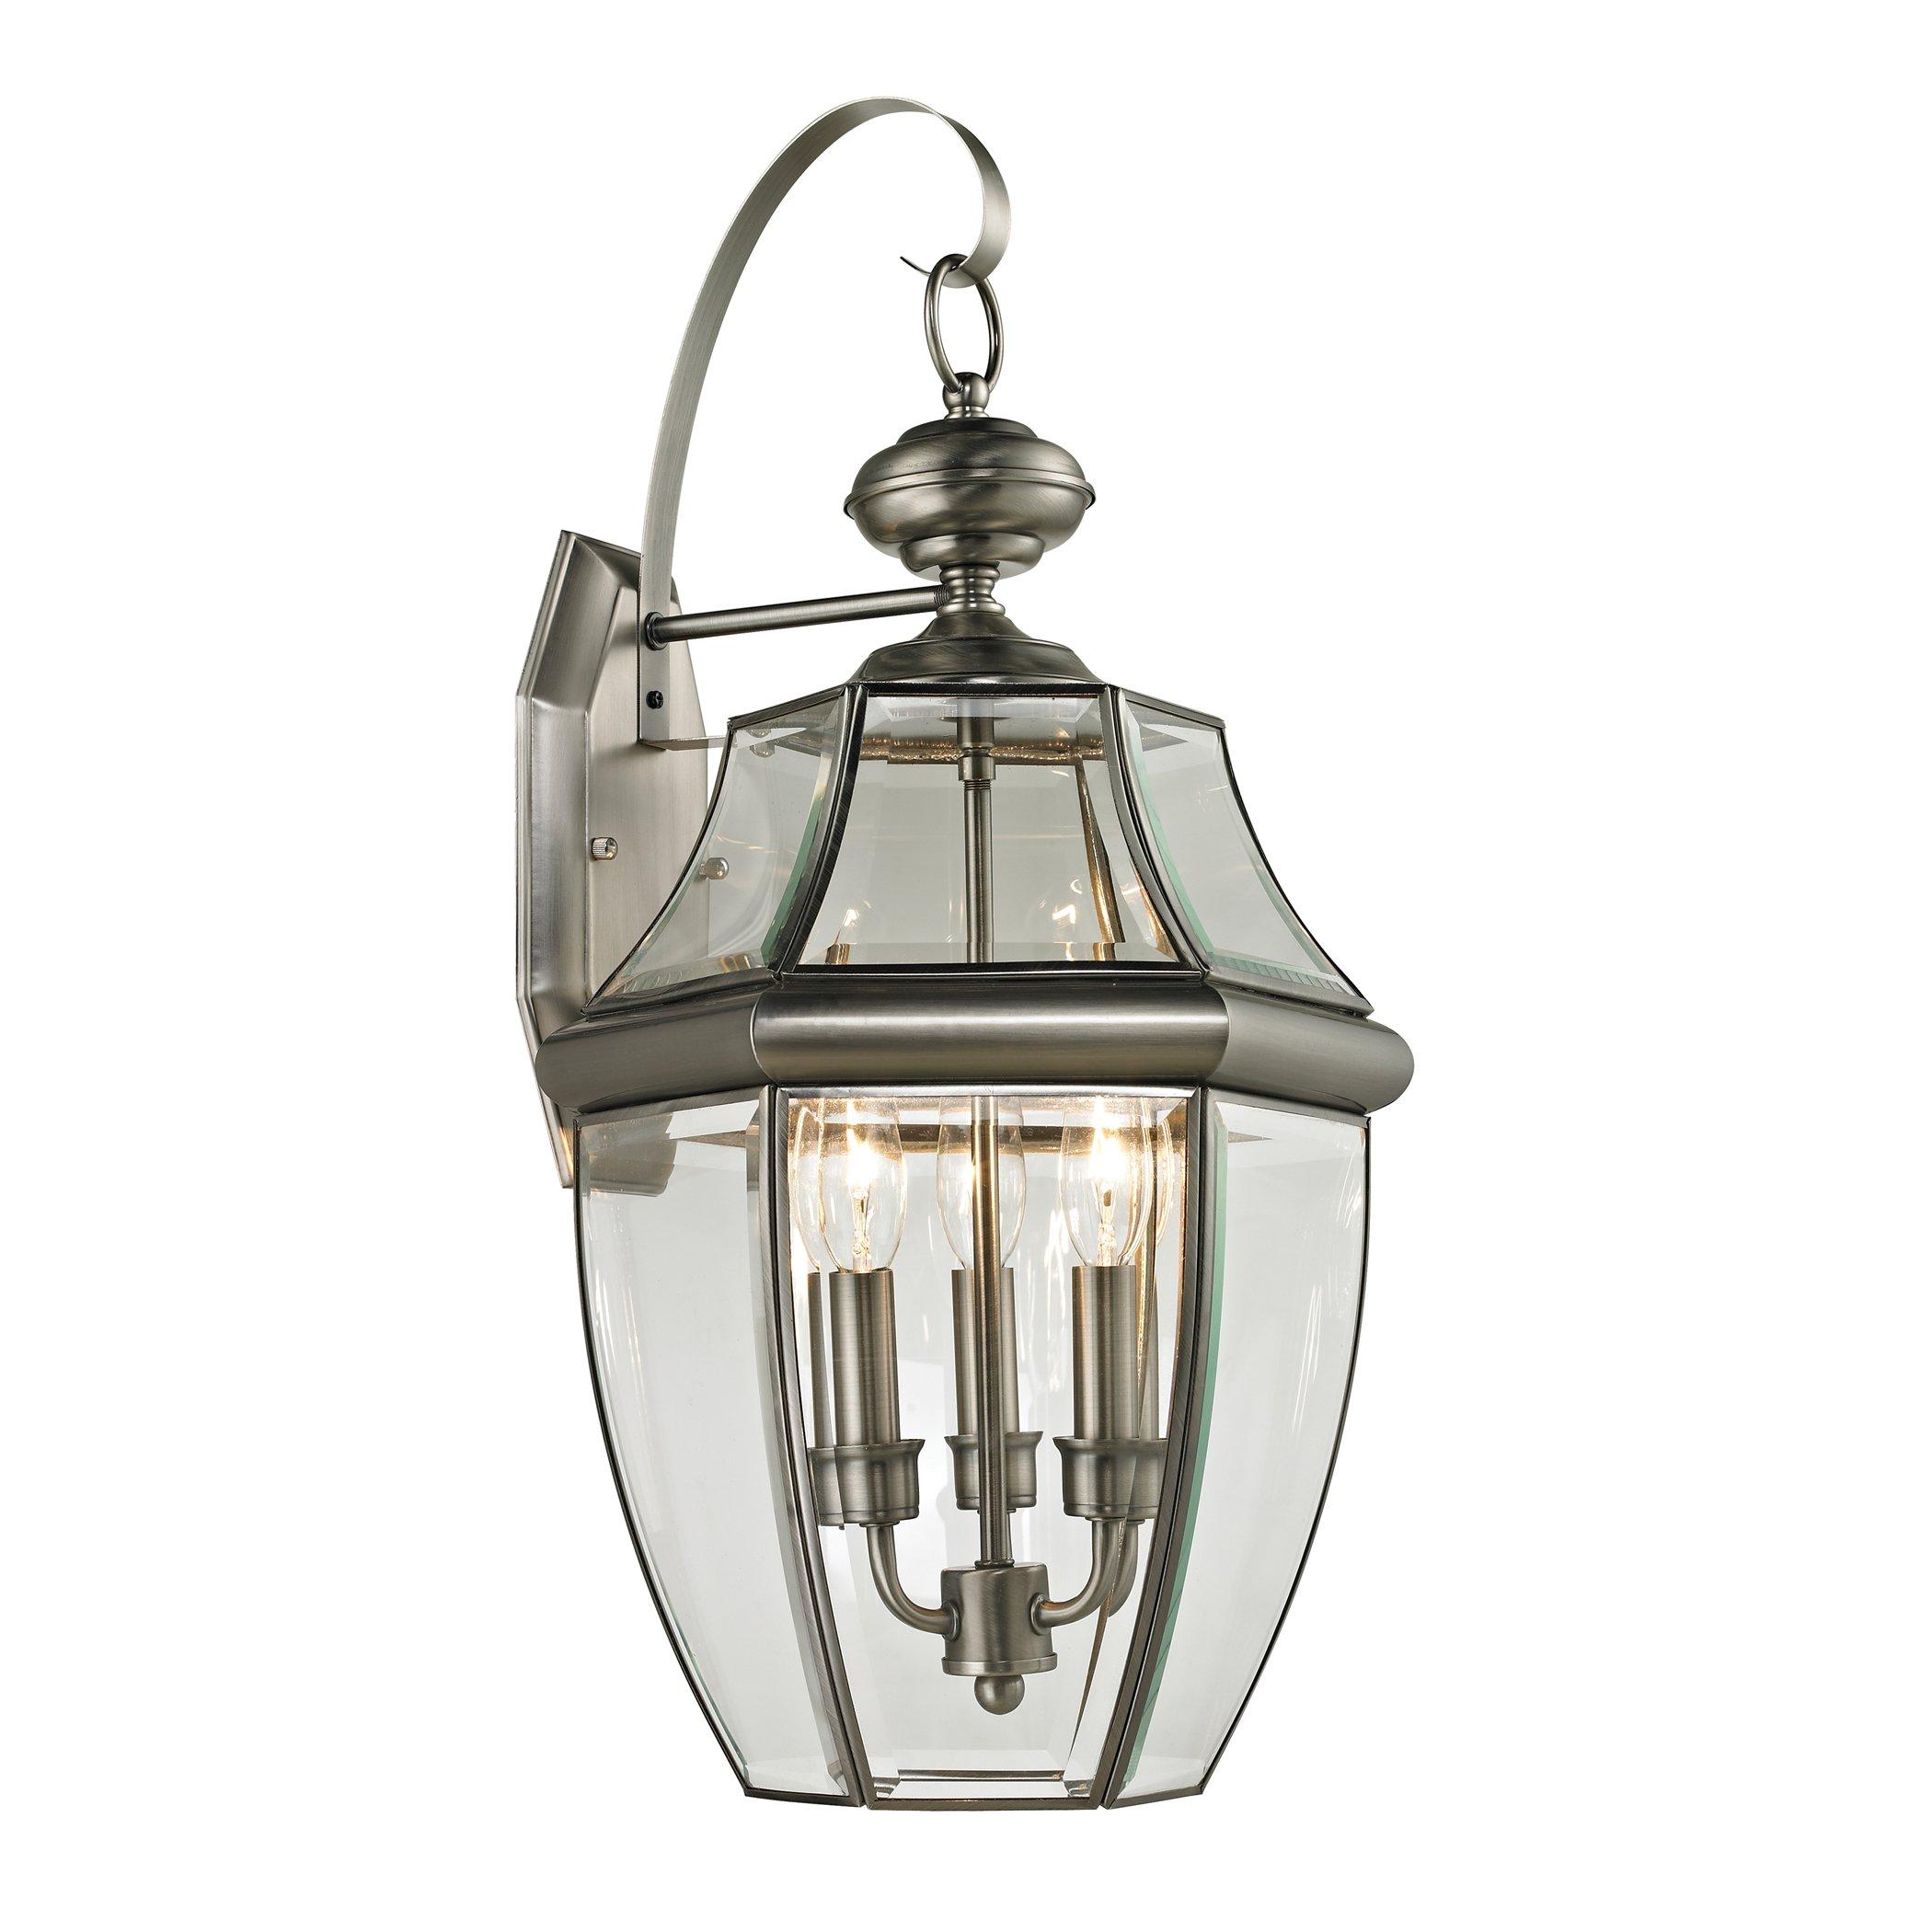 Cornerstone Lighting 8603EW/80 Ashford 3 Light Exterior Coach Lantern, Antique Nickel